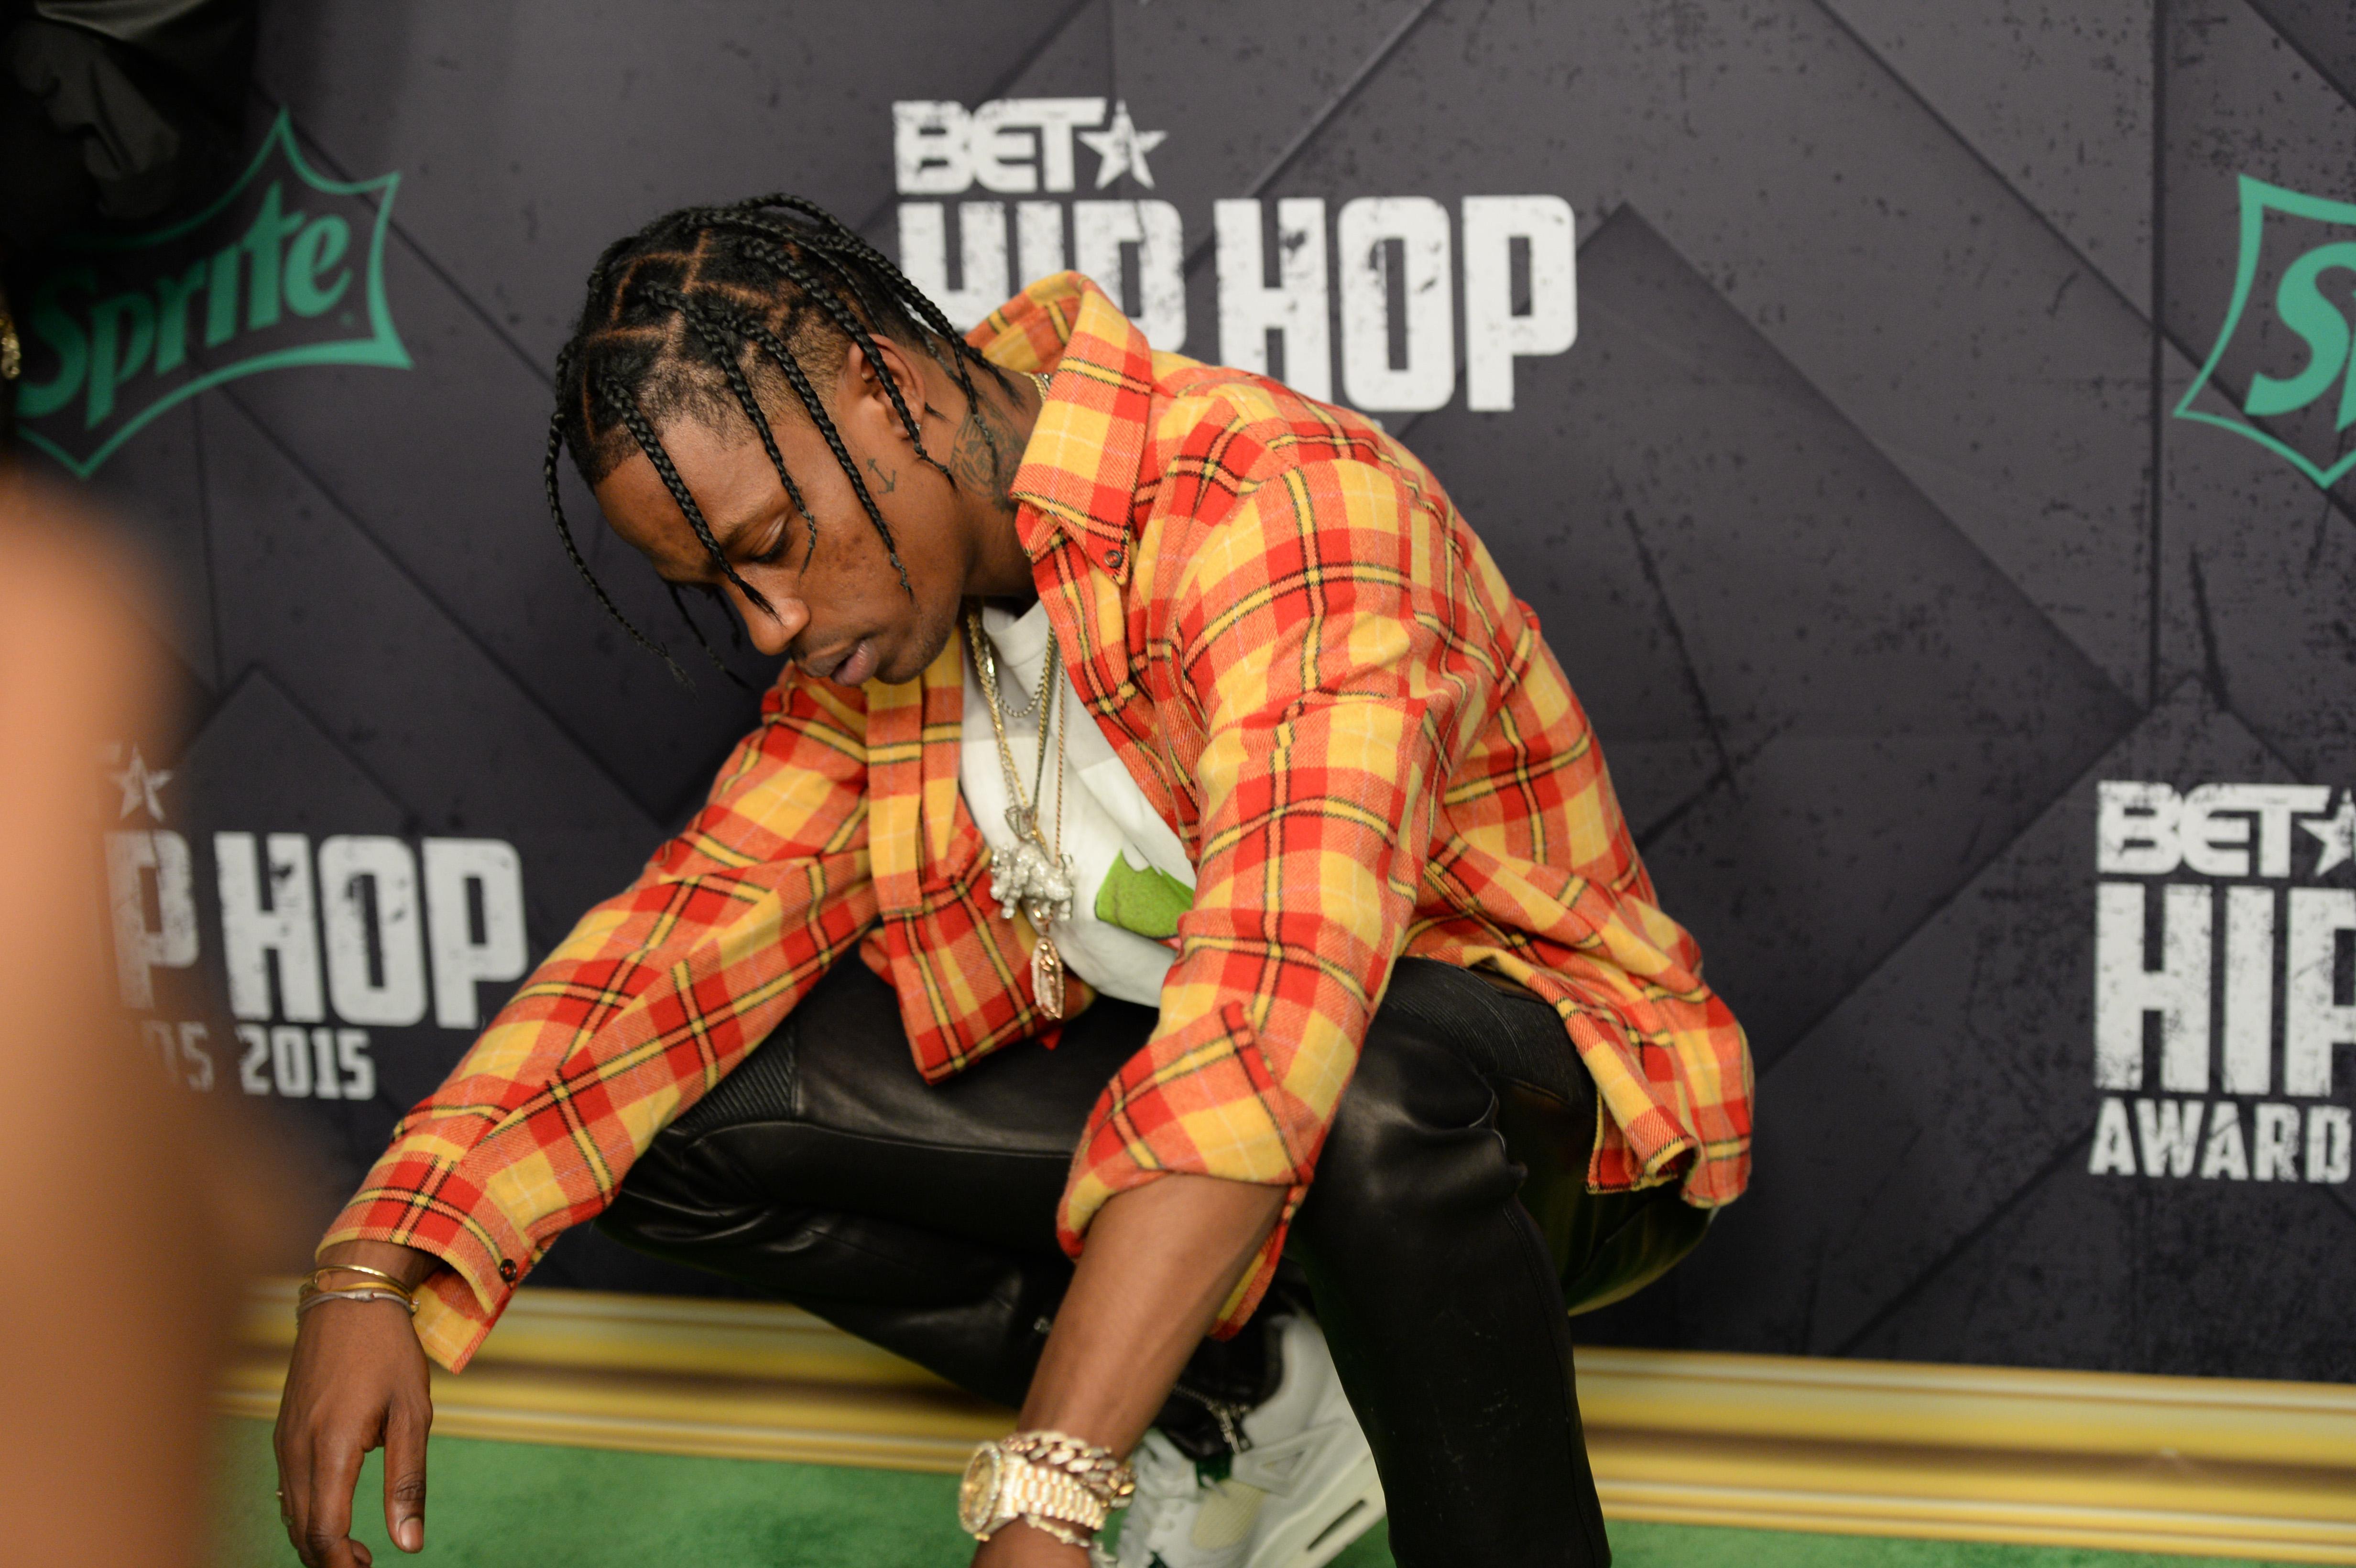 Travis Scott at the 2015 BET Hip-Hop Awards